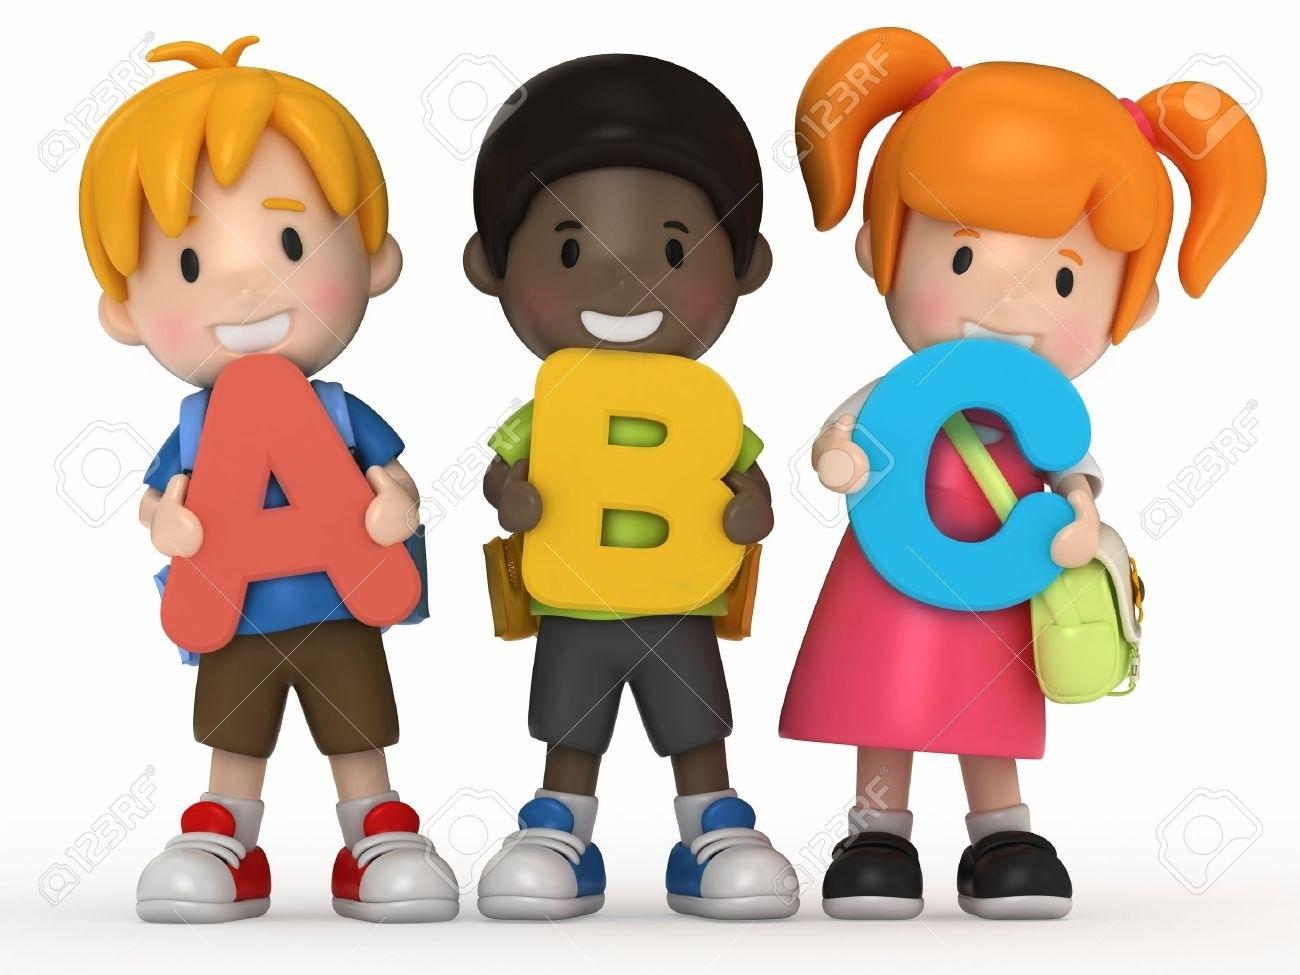 Abc clipart nursery school, Abc nursery school Transparent.